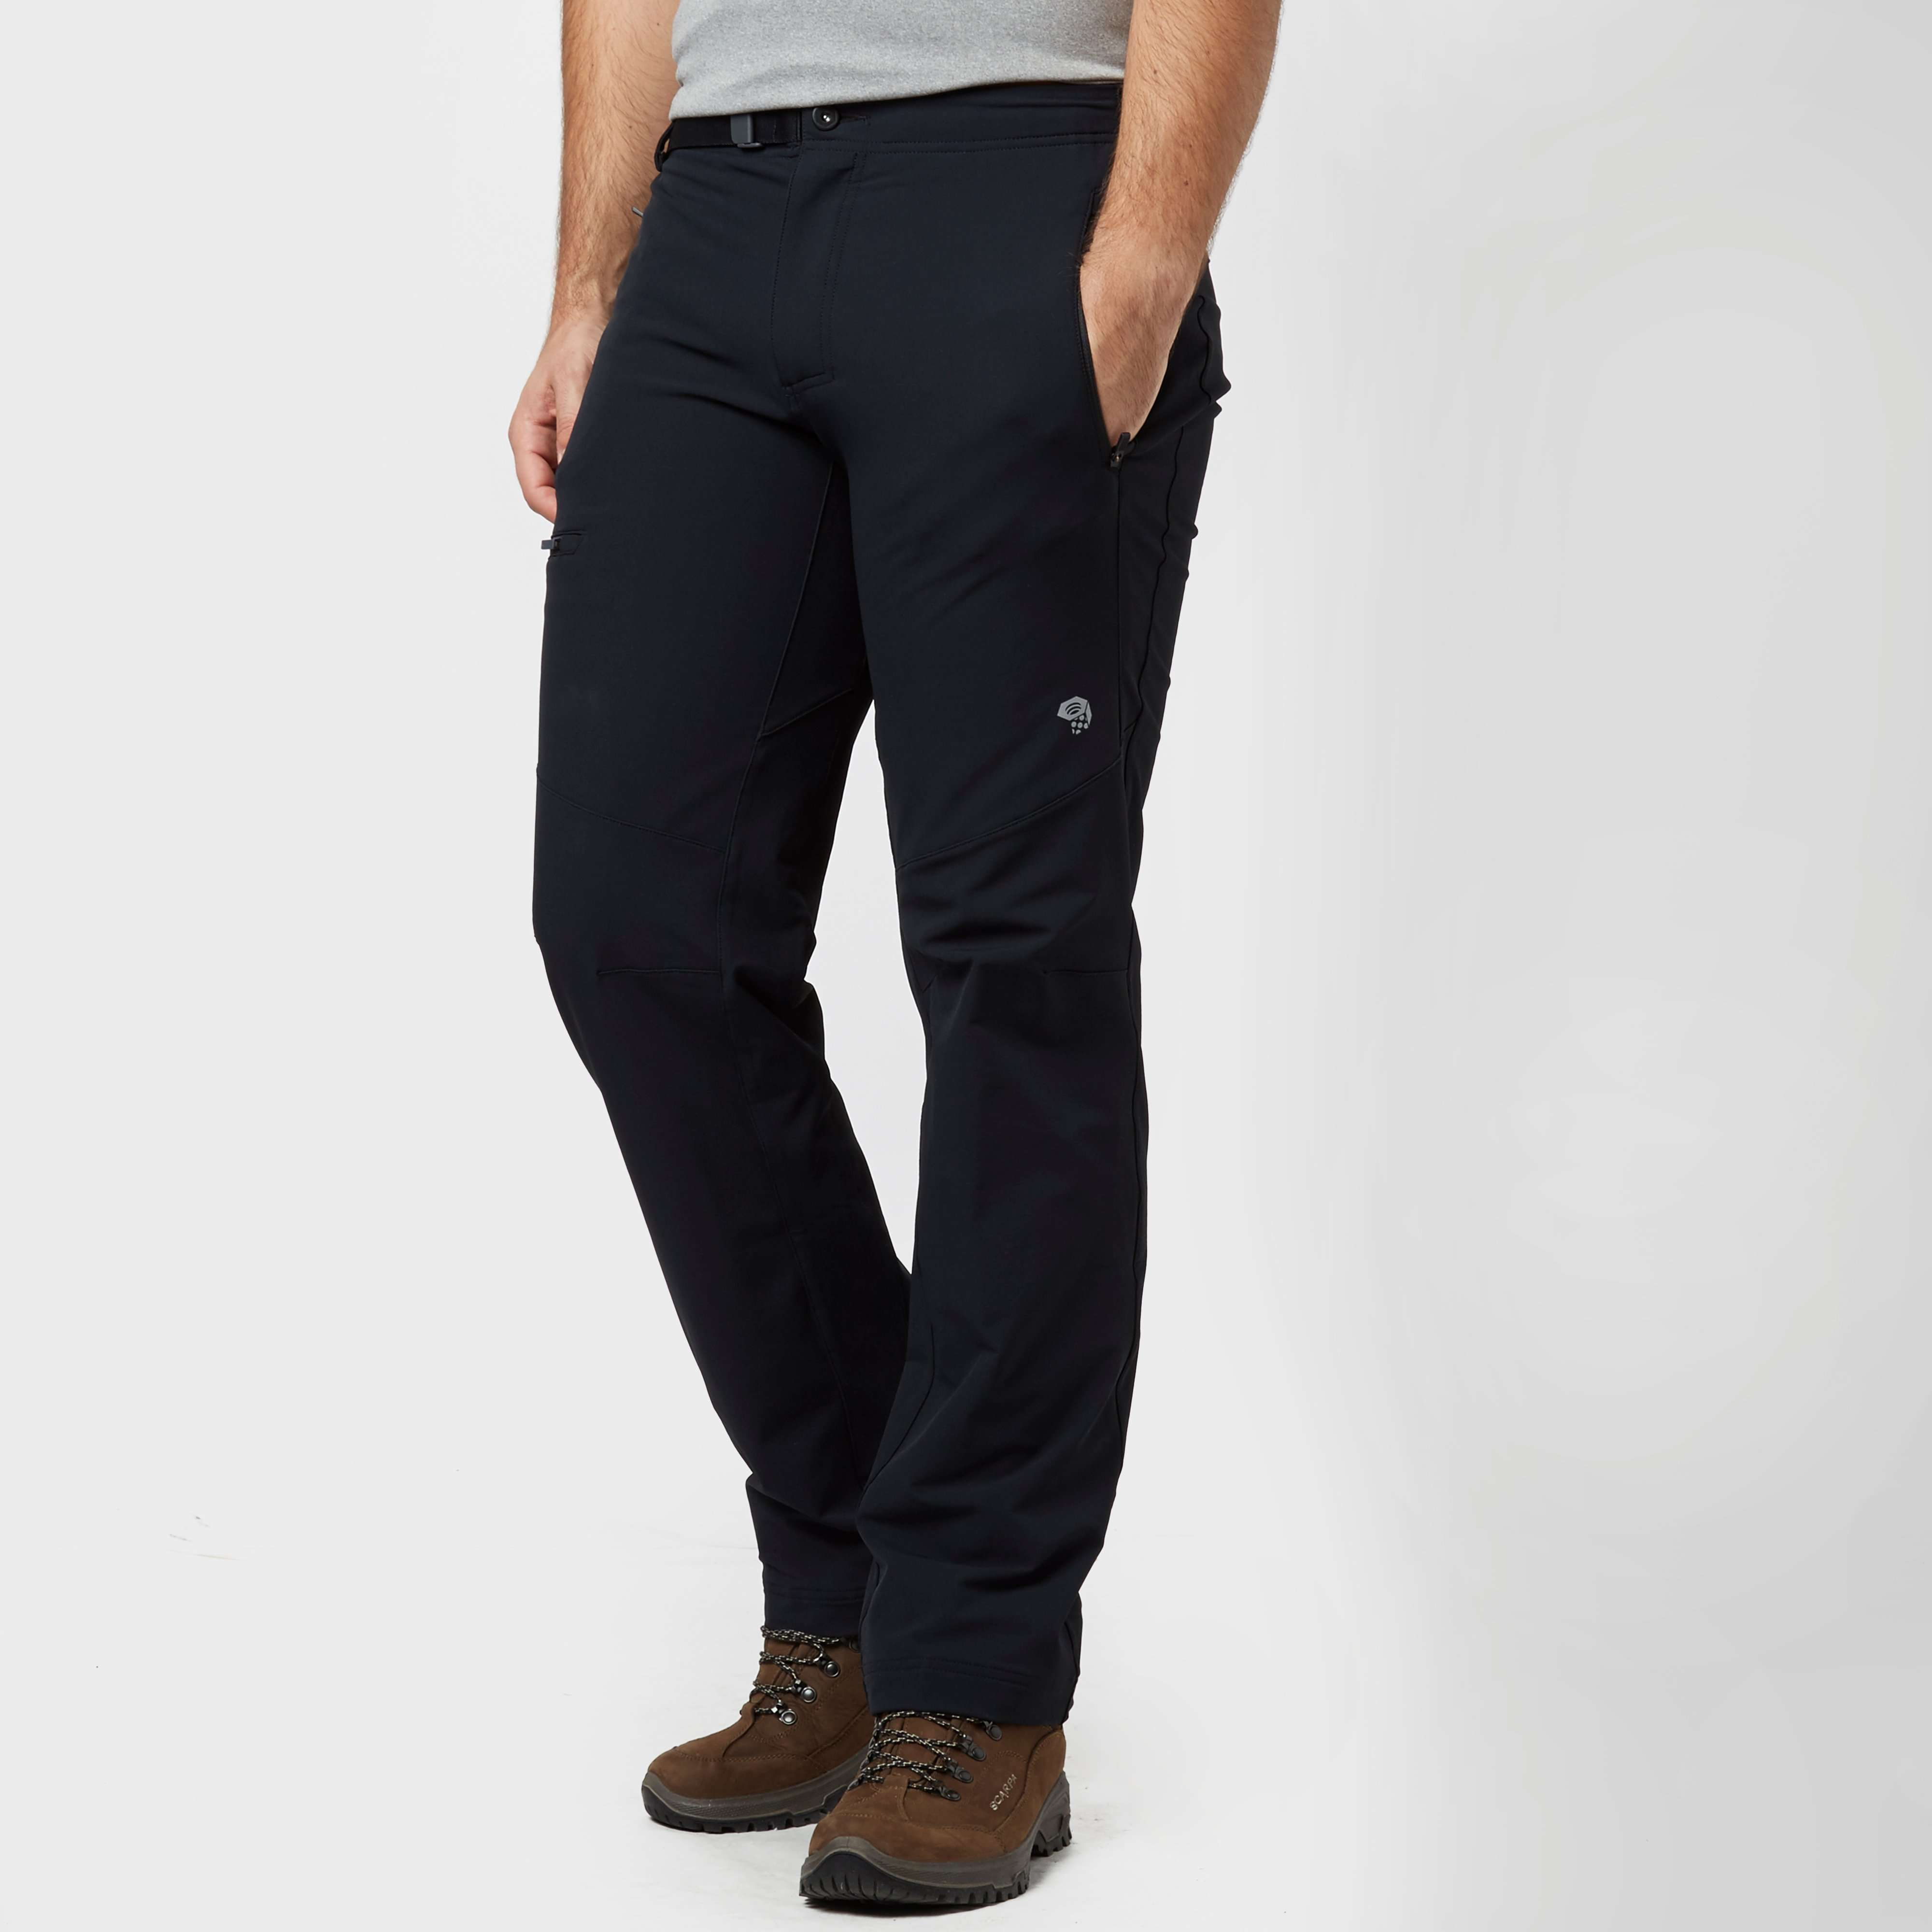 MOUNTAIN HARDWEAR Men's Chockstone Trousers